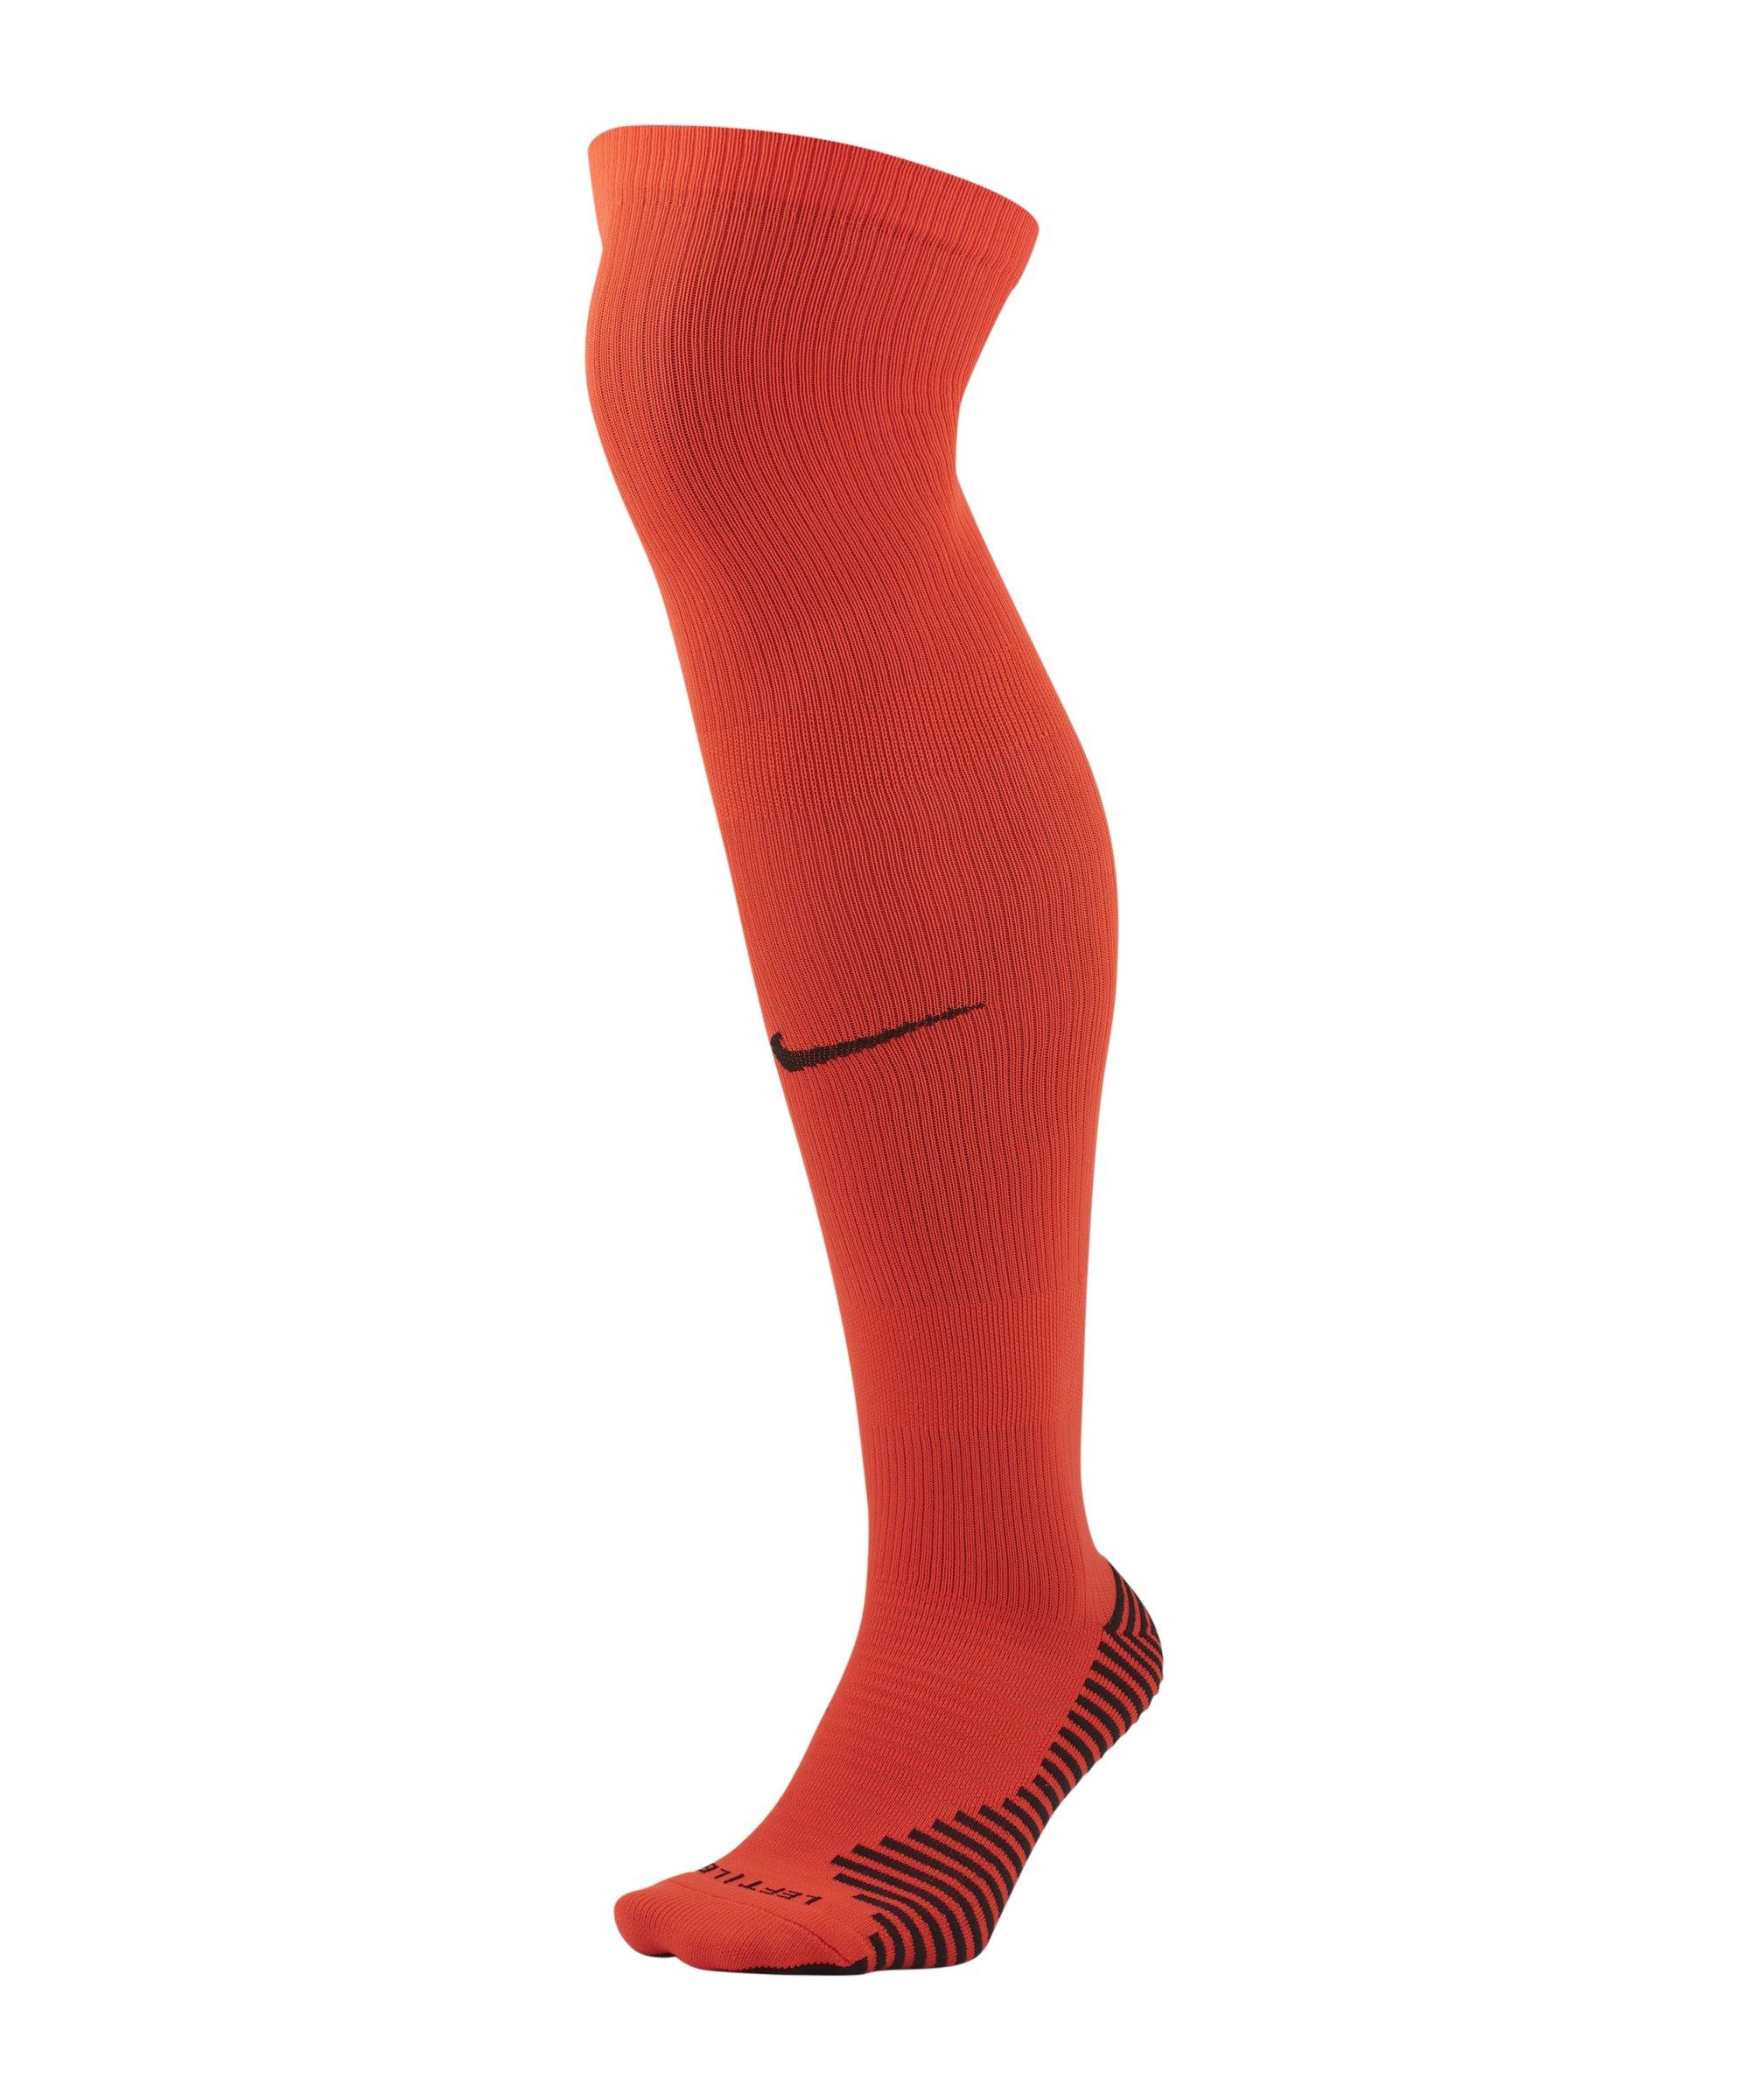 Nike Matchfit OTC Knee High Stutzenstrumpf F635 - rot